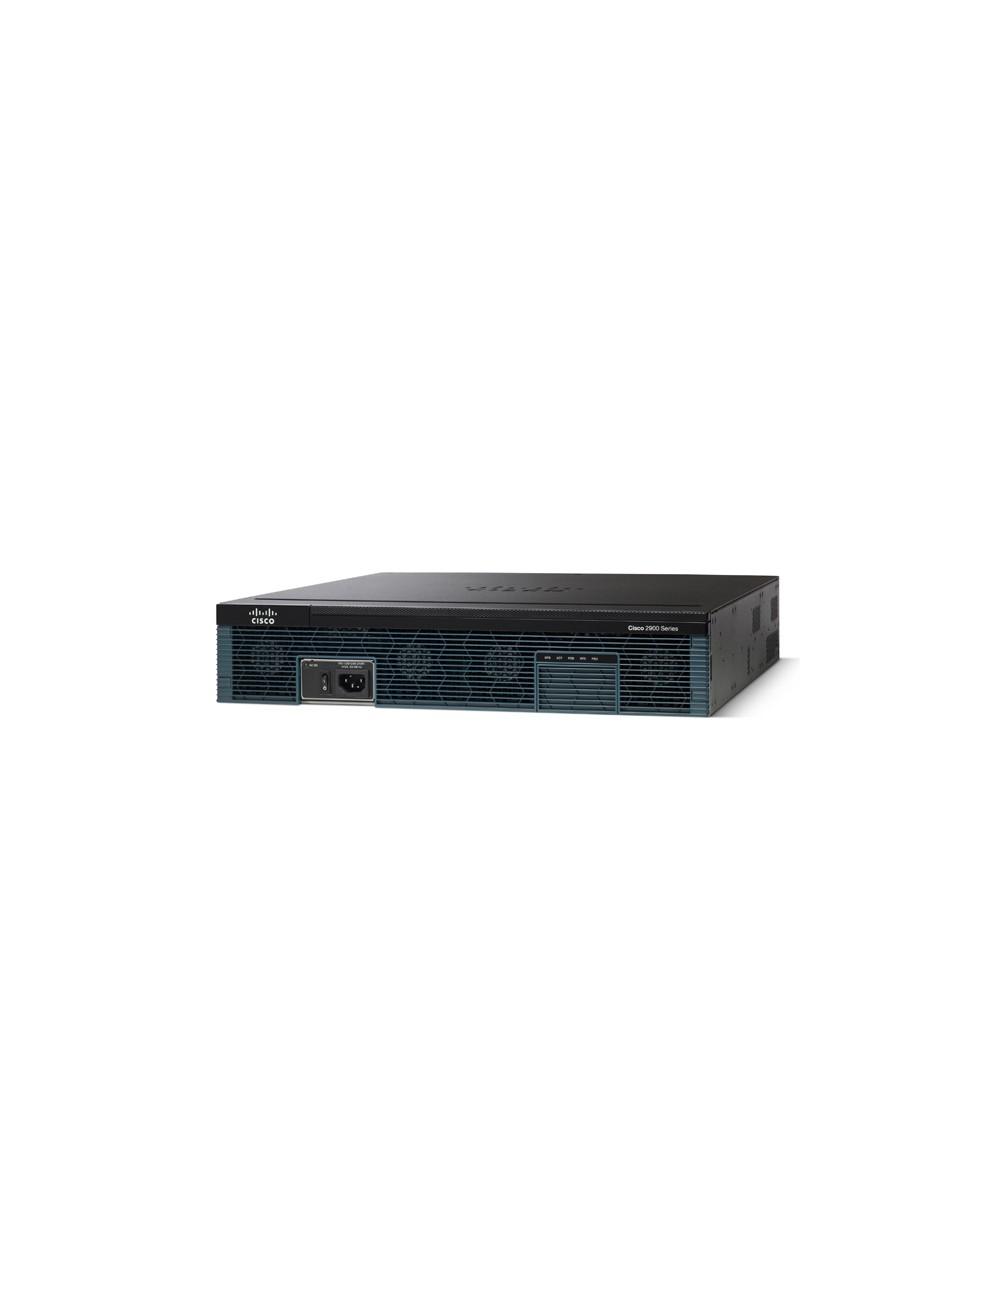 Cisco CISCO2921/K9 Integrated Services Router